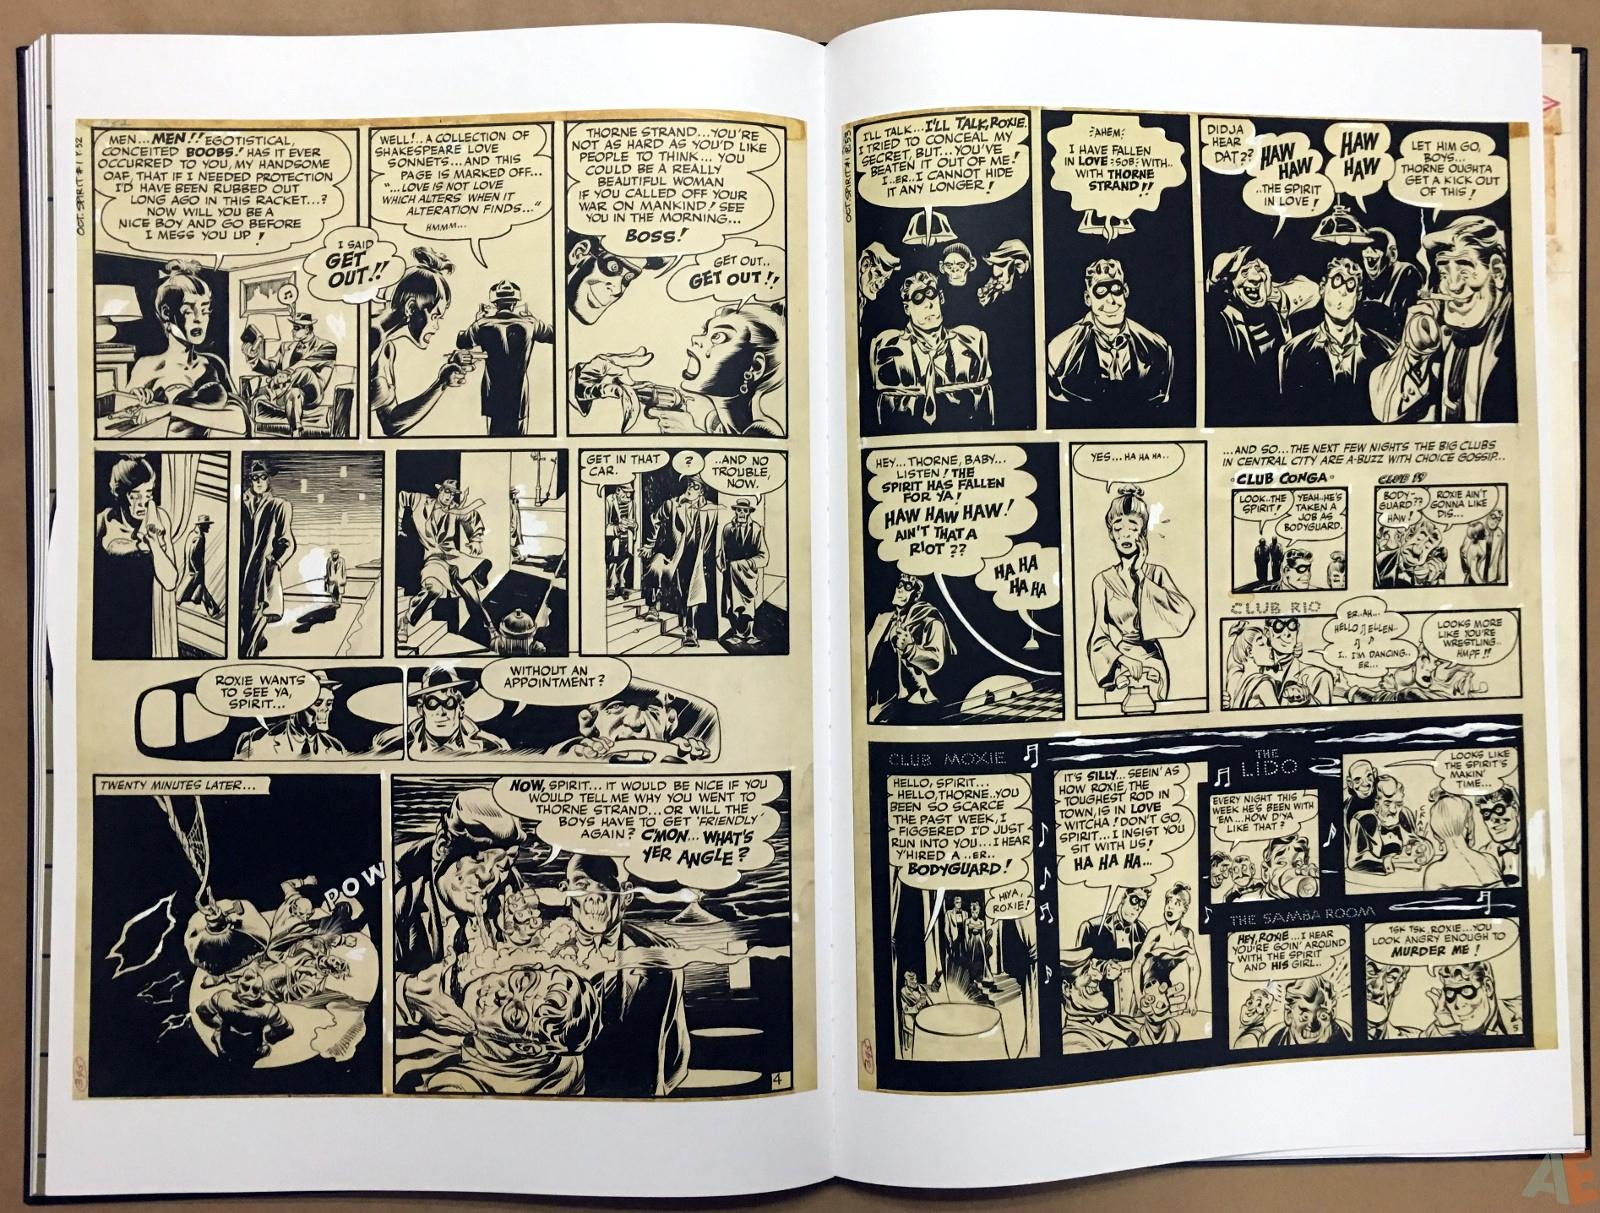 Will Eisner's The Spirit Artist's Edition